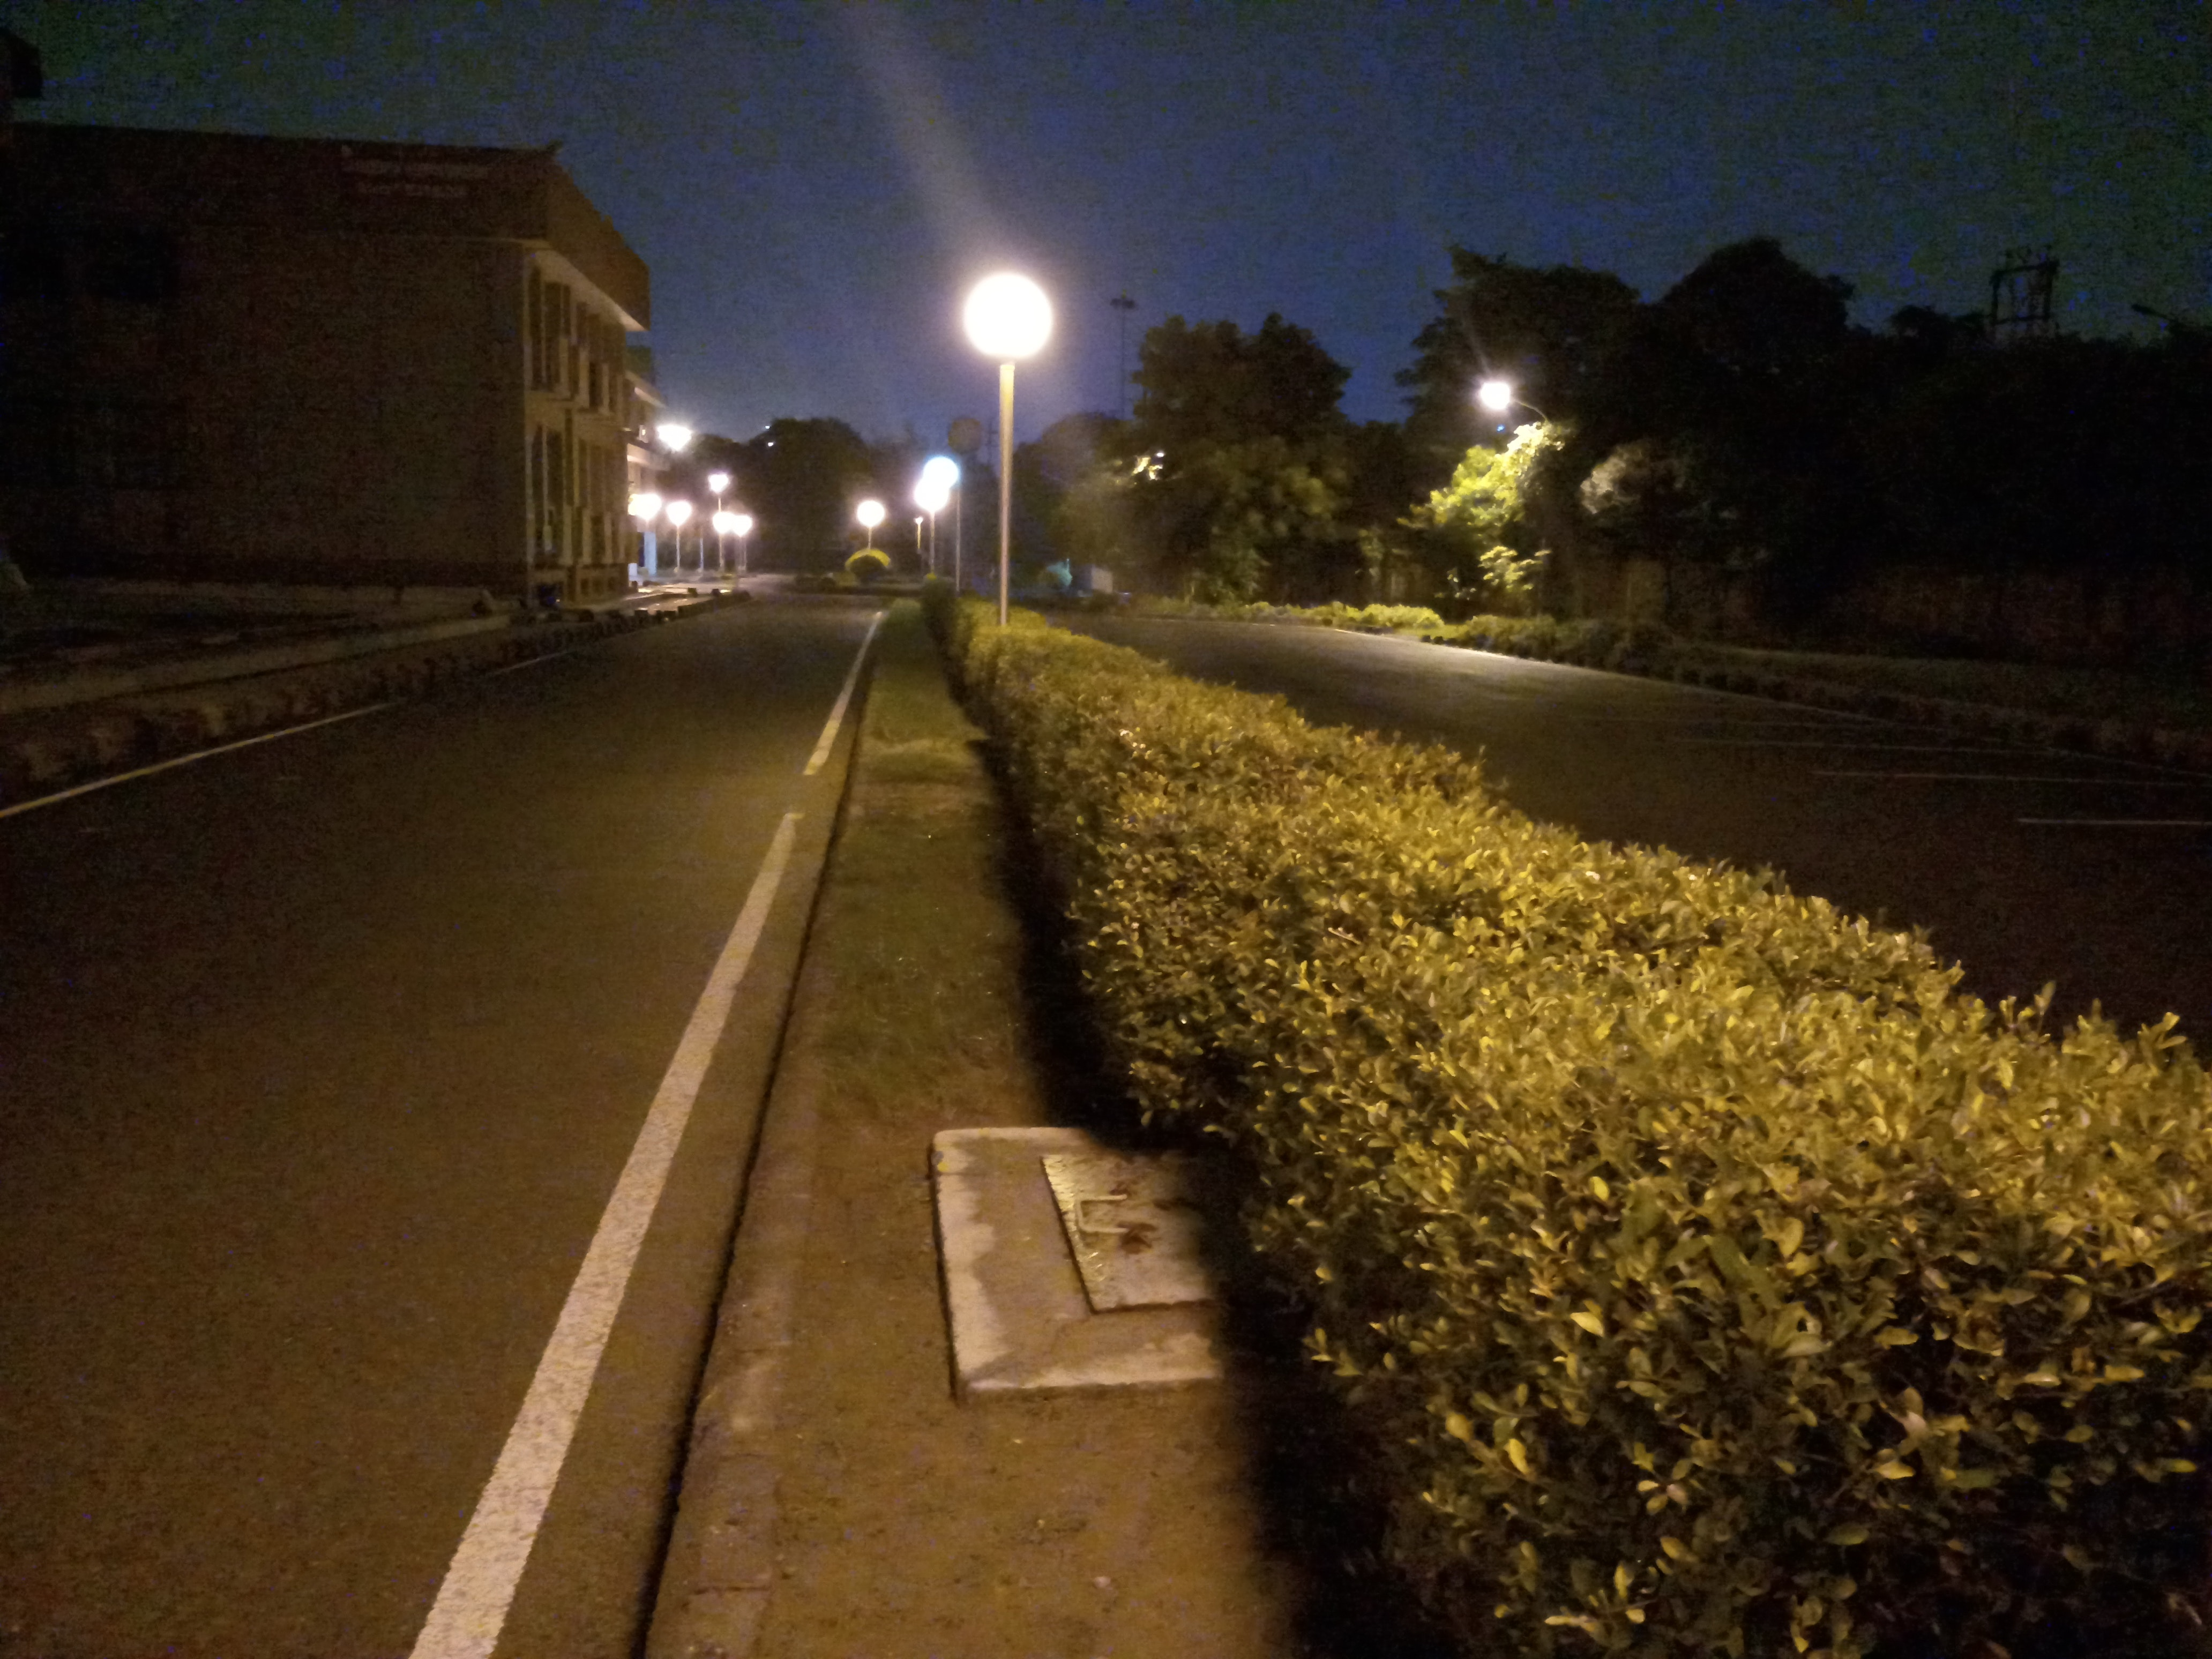 Free stock photo of Night garden